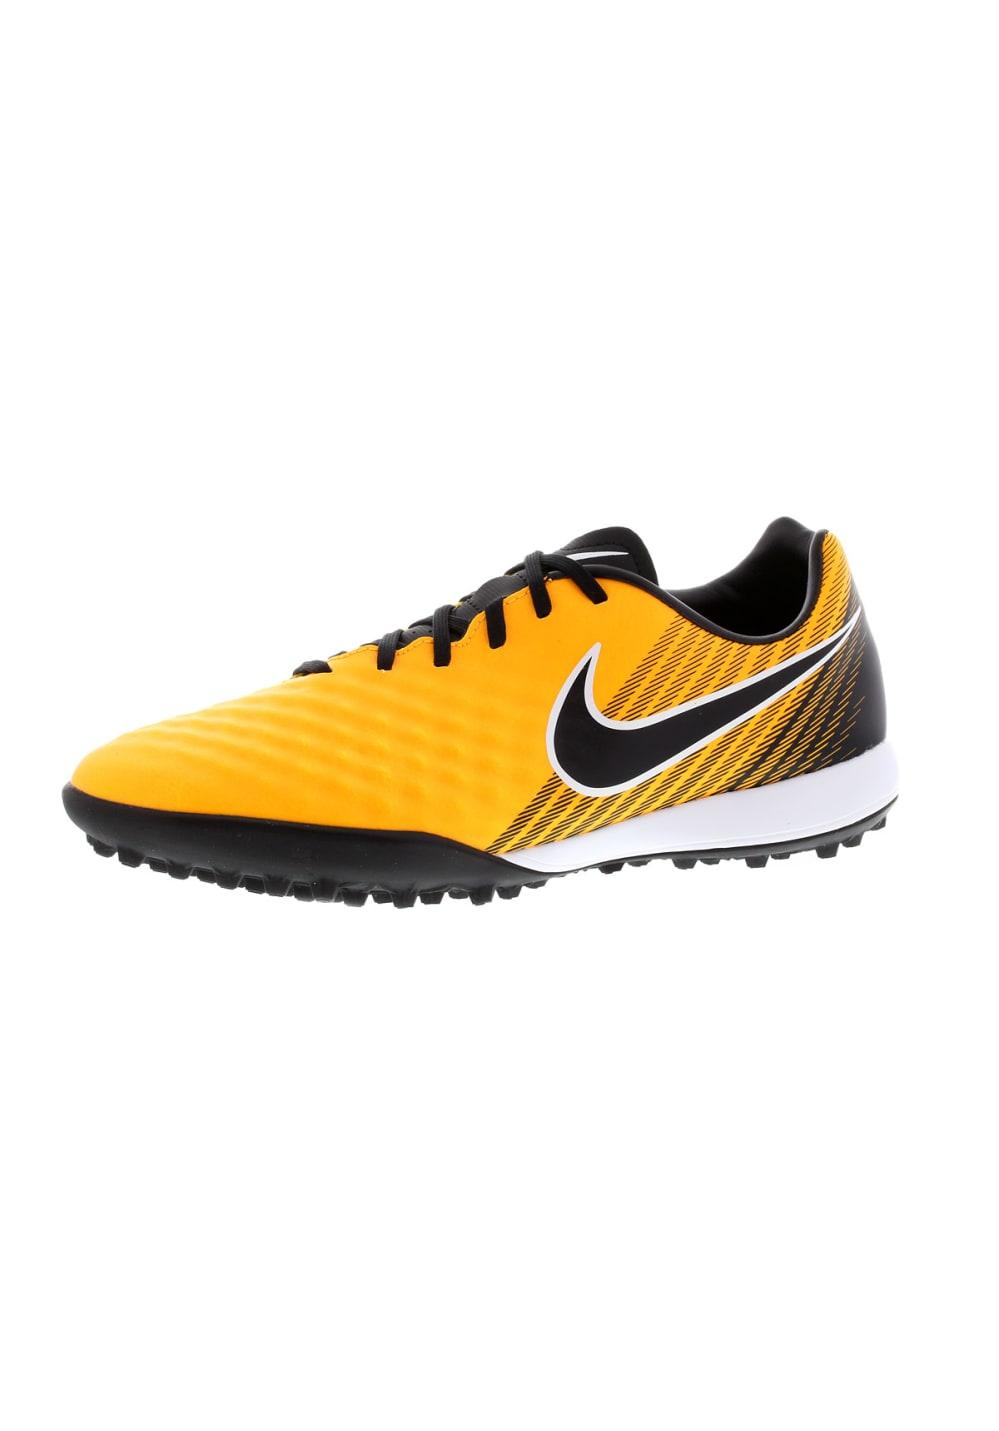 e22768e472a8a Nike MagistaX Onda II TF - Football Shoes for Men - Orange